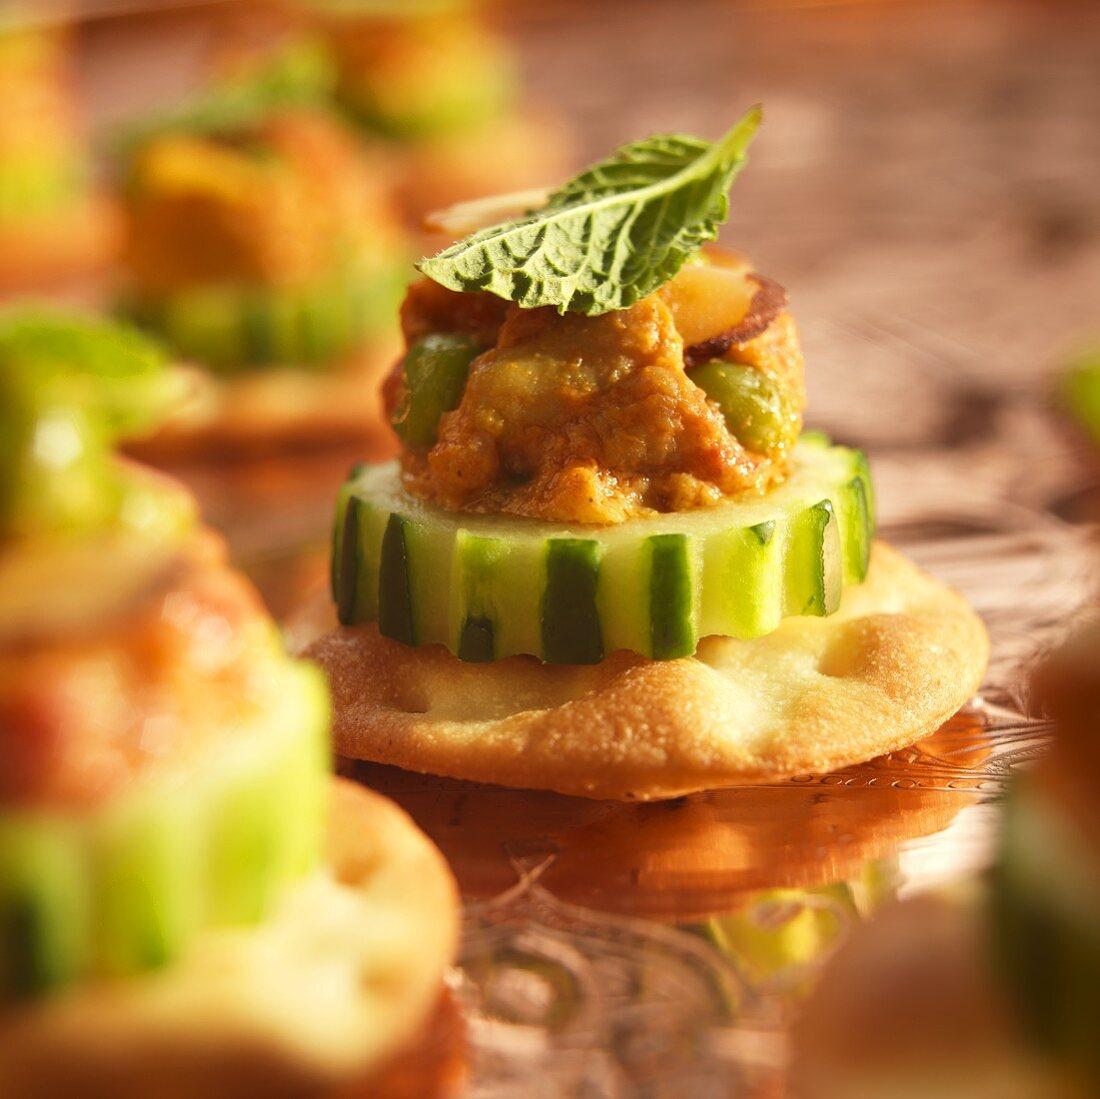 Chicken Tikka Amuse Bouche on Cucumber and Cracker